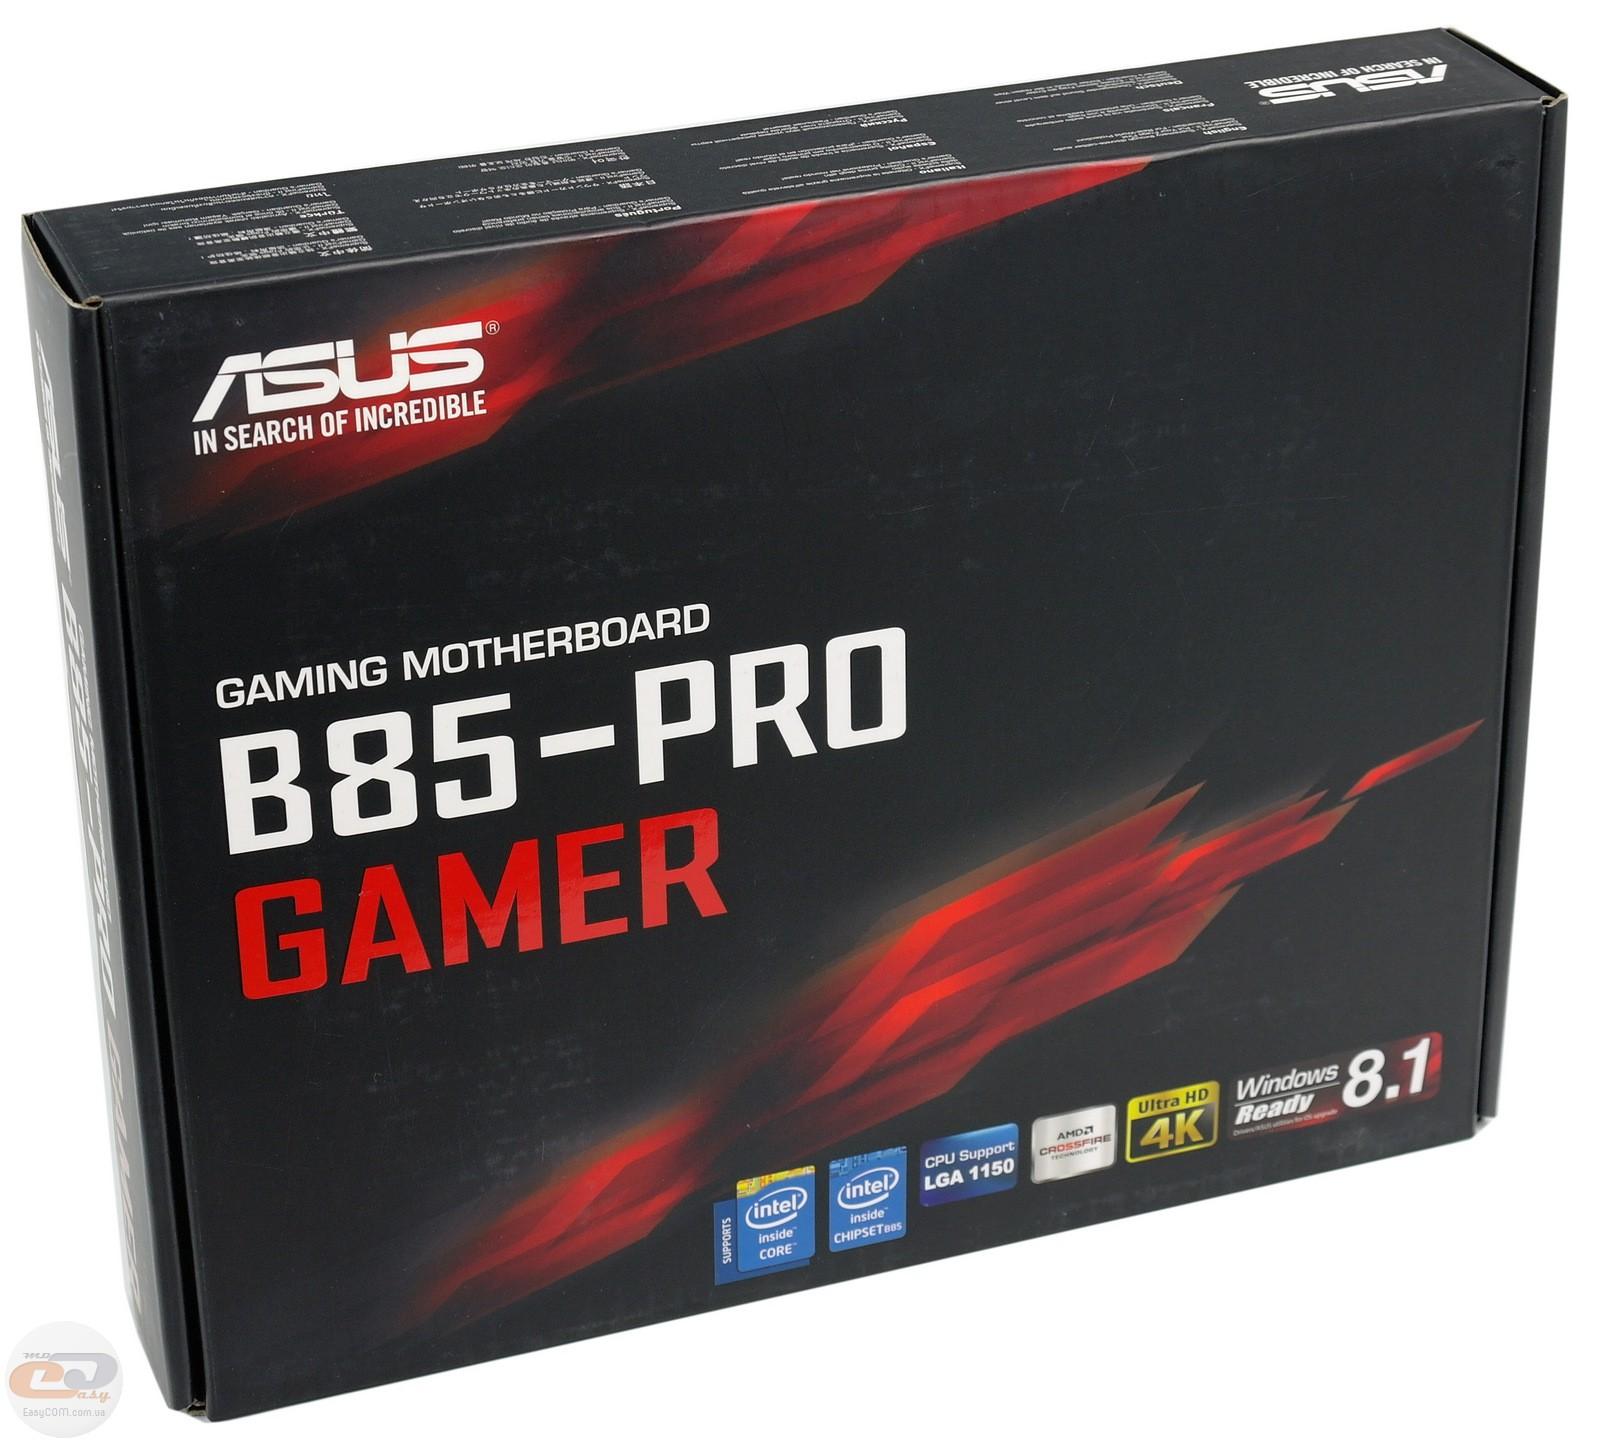 Asus B85 Pro Gamer Driver Download